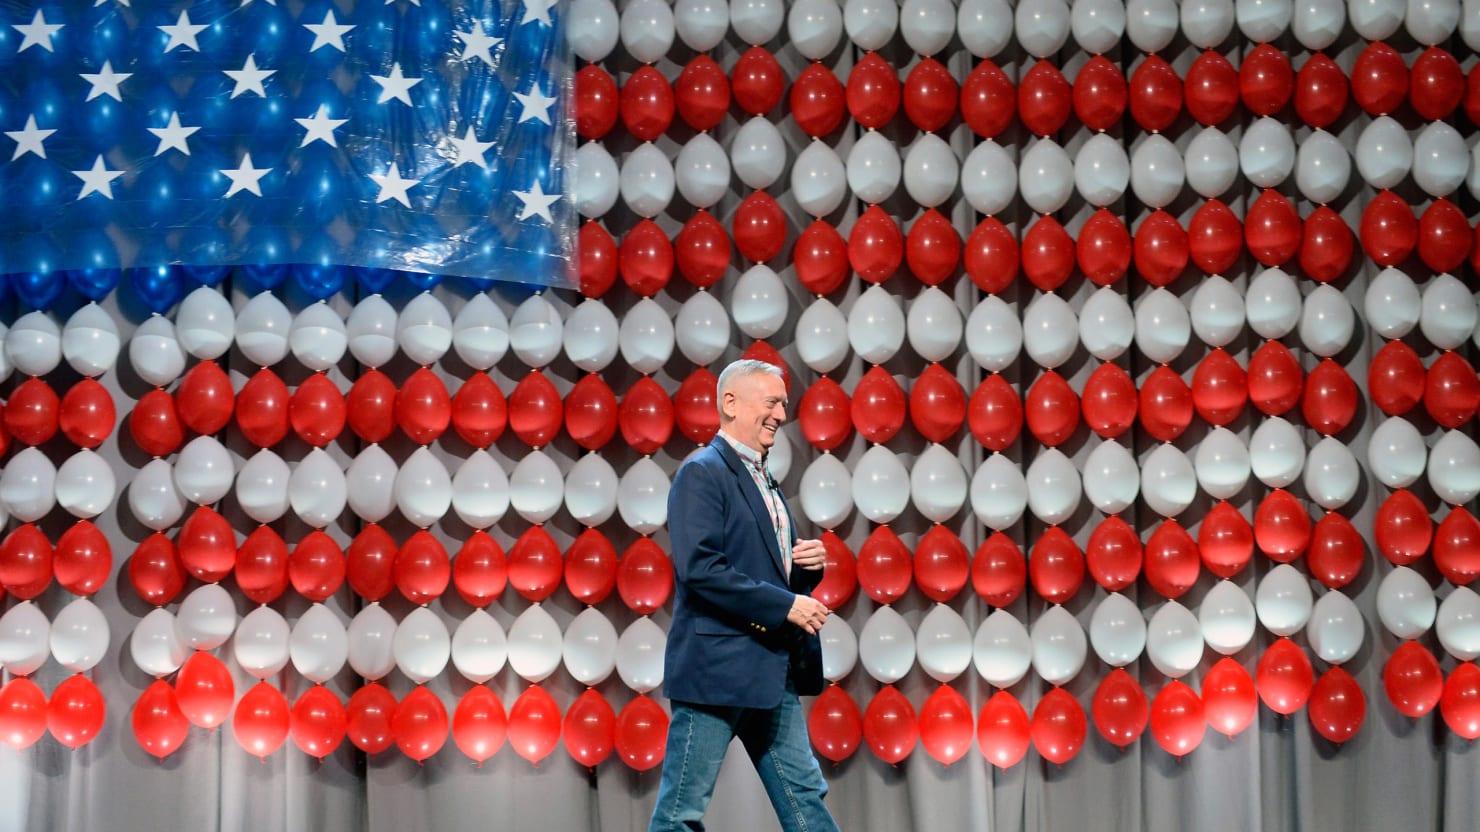 The Secret Movement to Draft General James Mattis for President